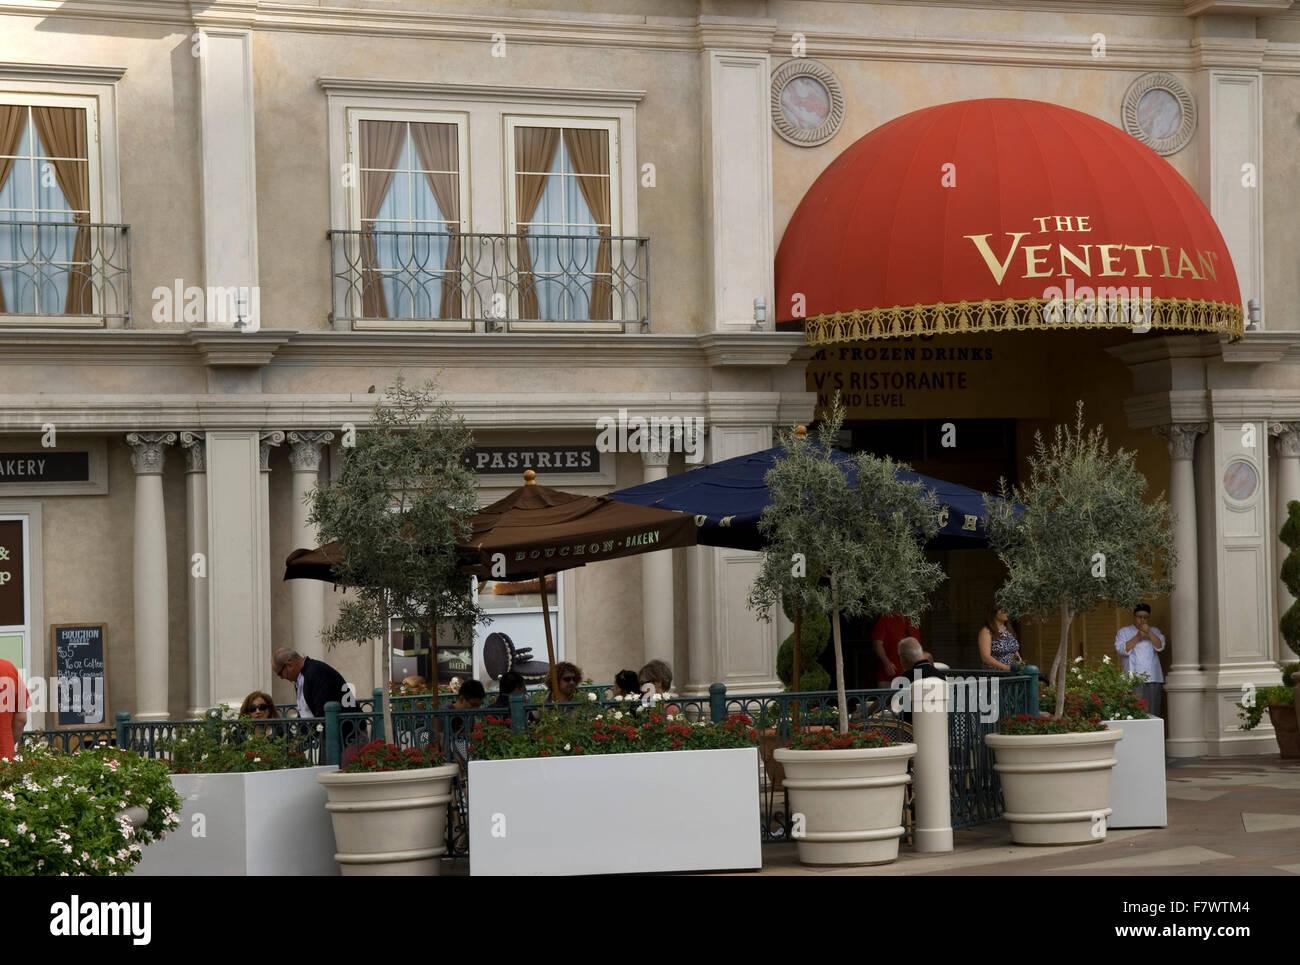 The Venetian Resort In Las Vegas Nevada USA. - Stock Image